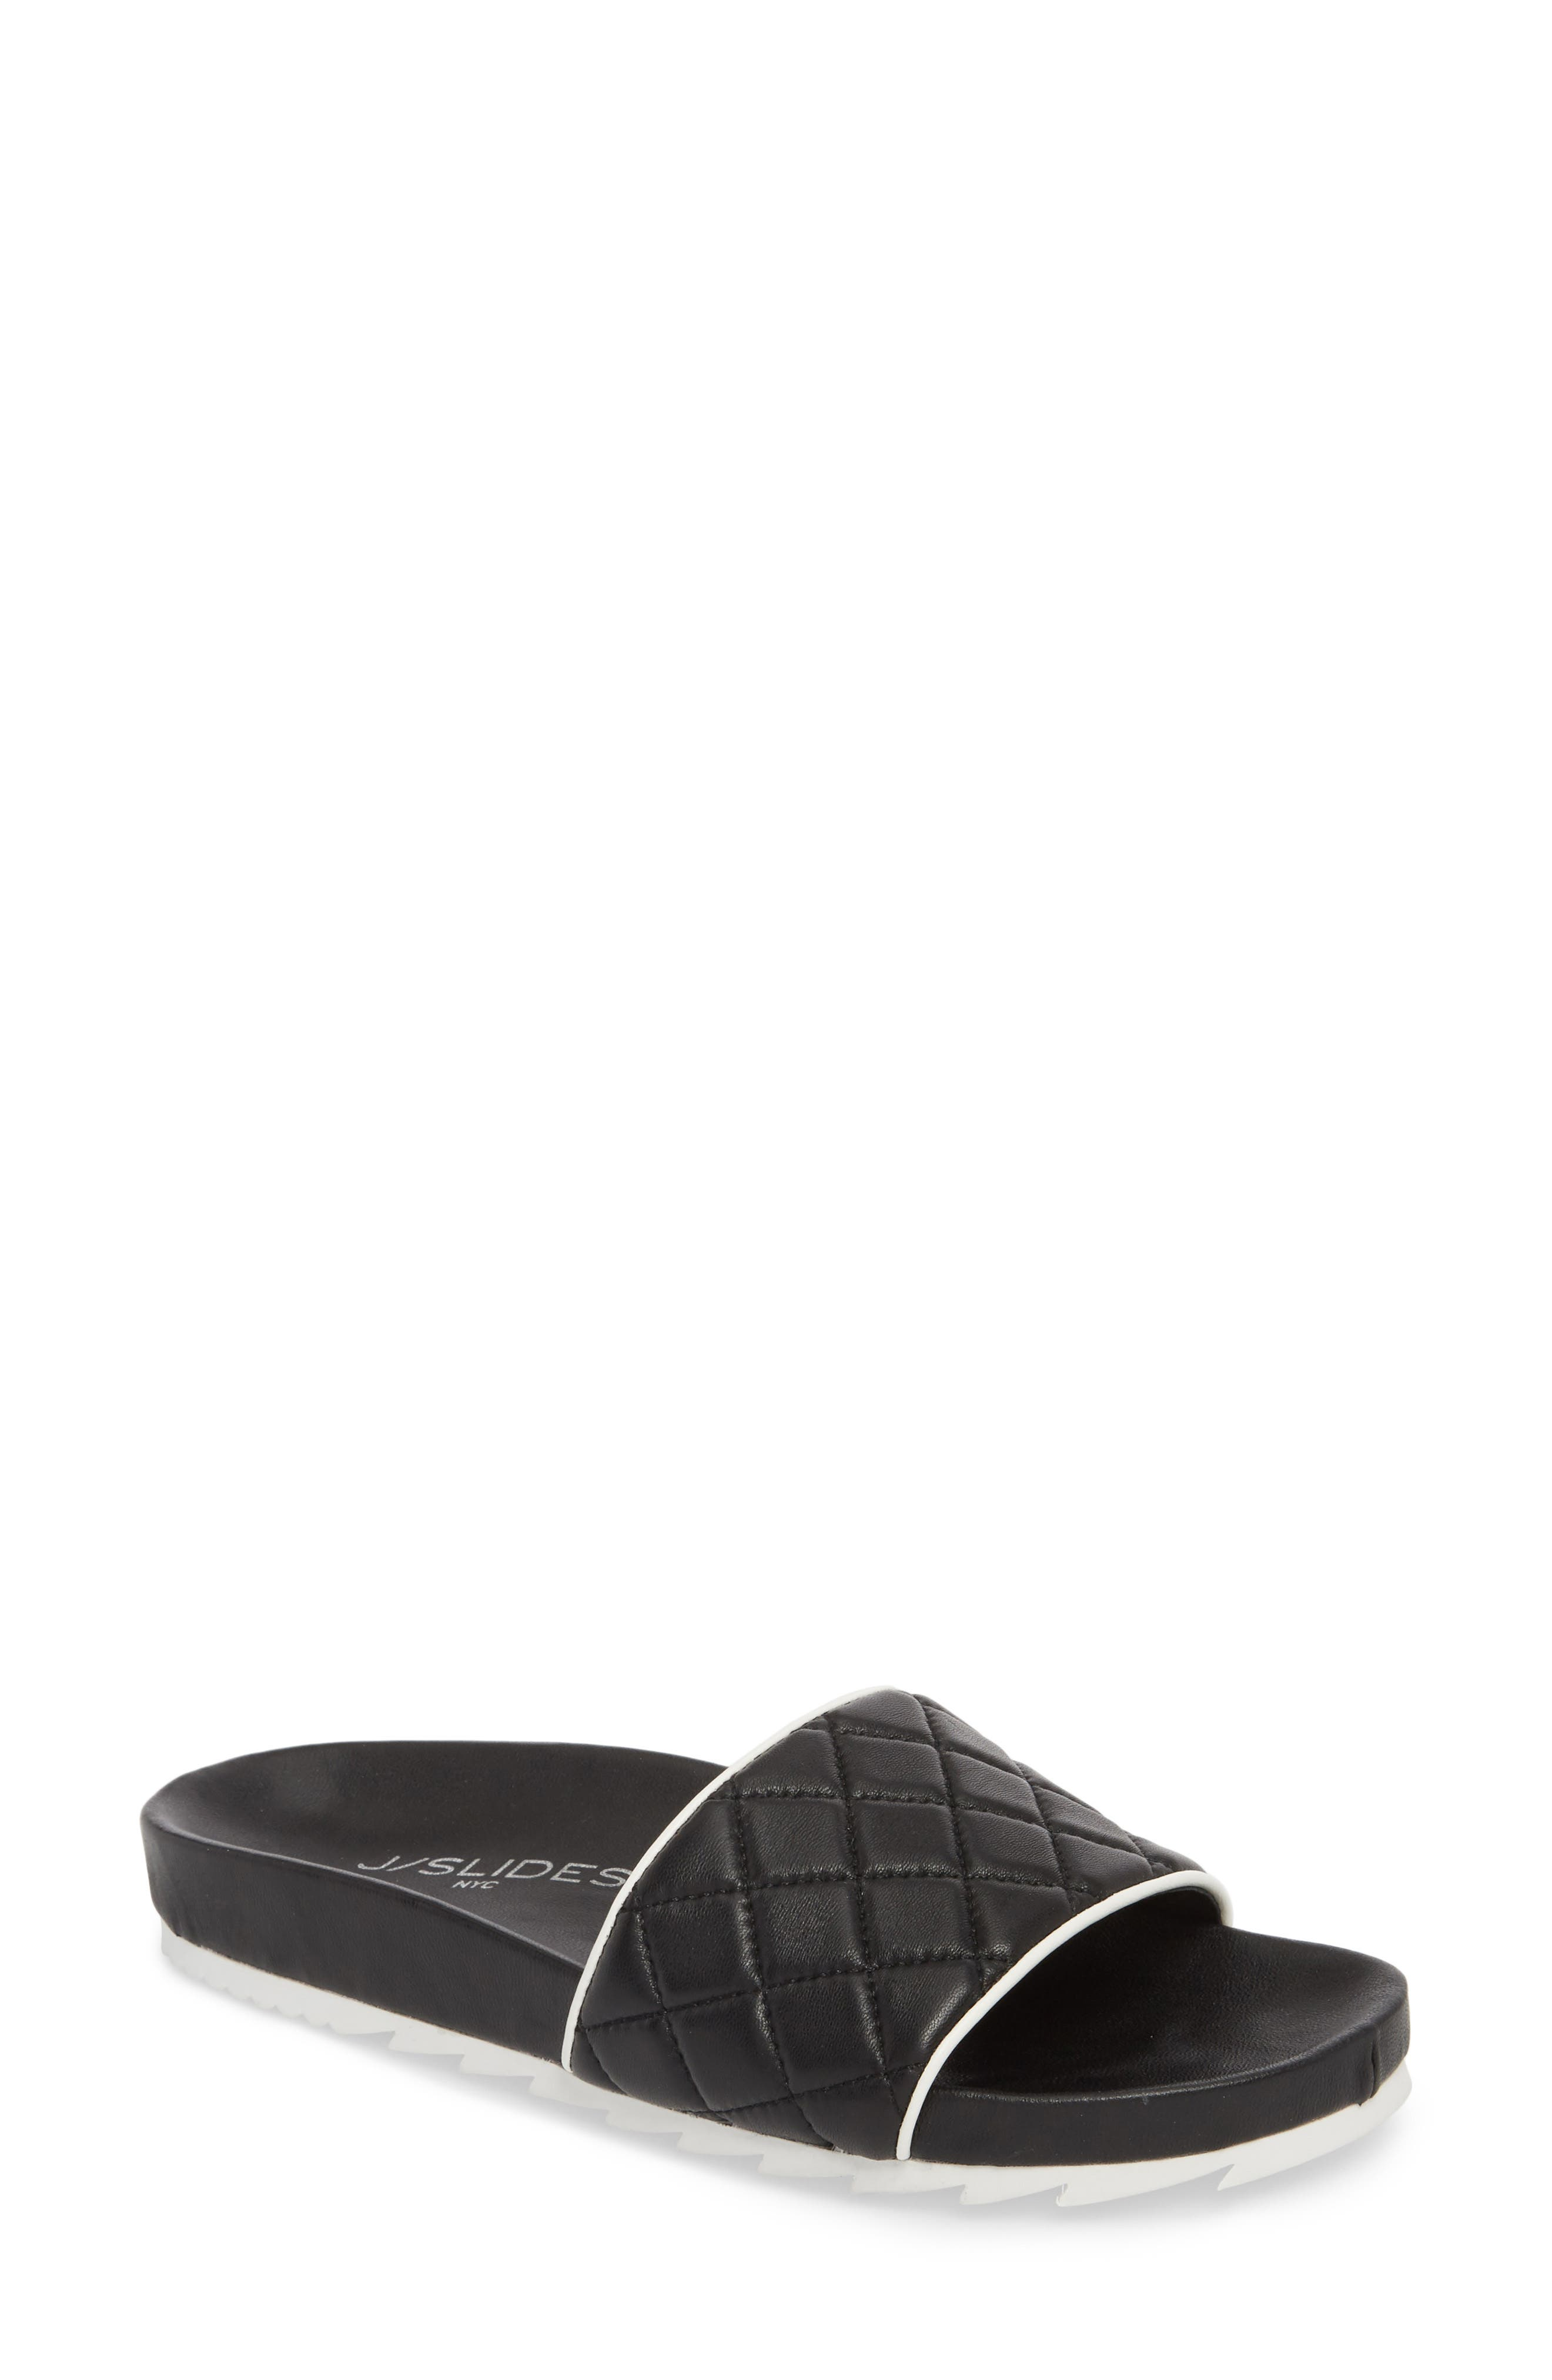 Edge Slide Sandal,                         Main,                         color, BLACK LEATHER